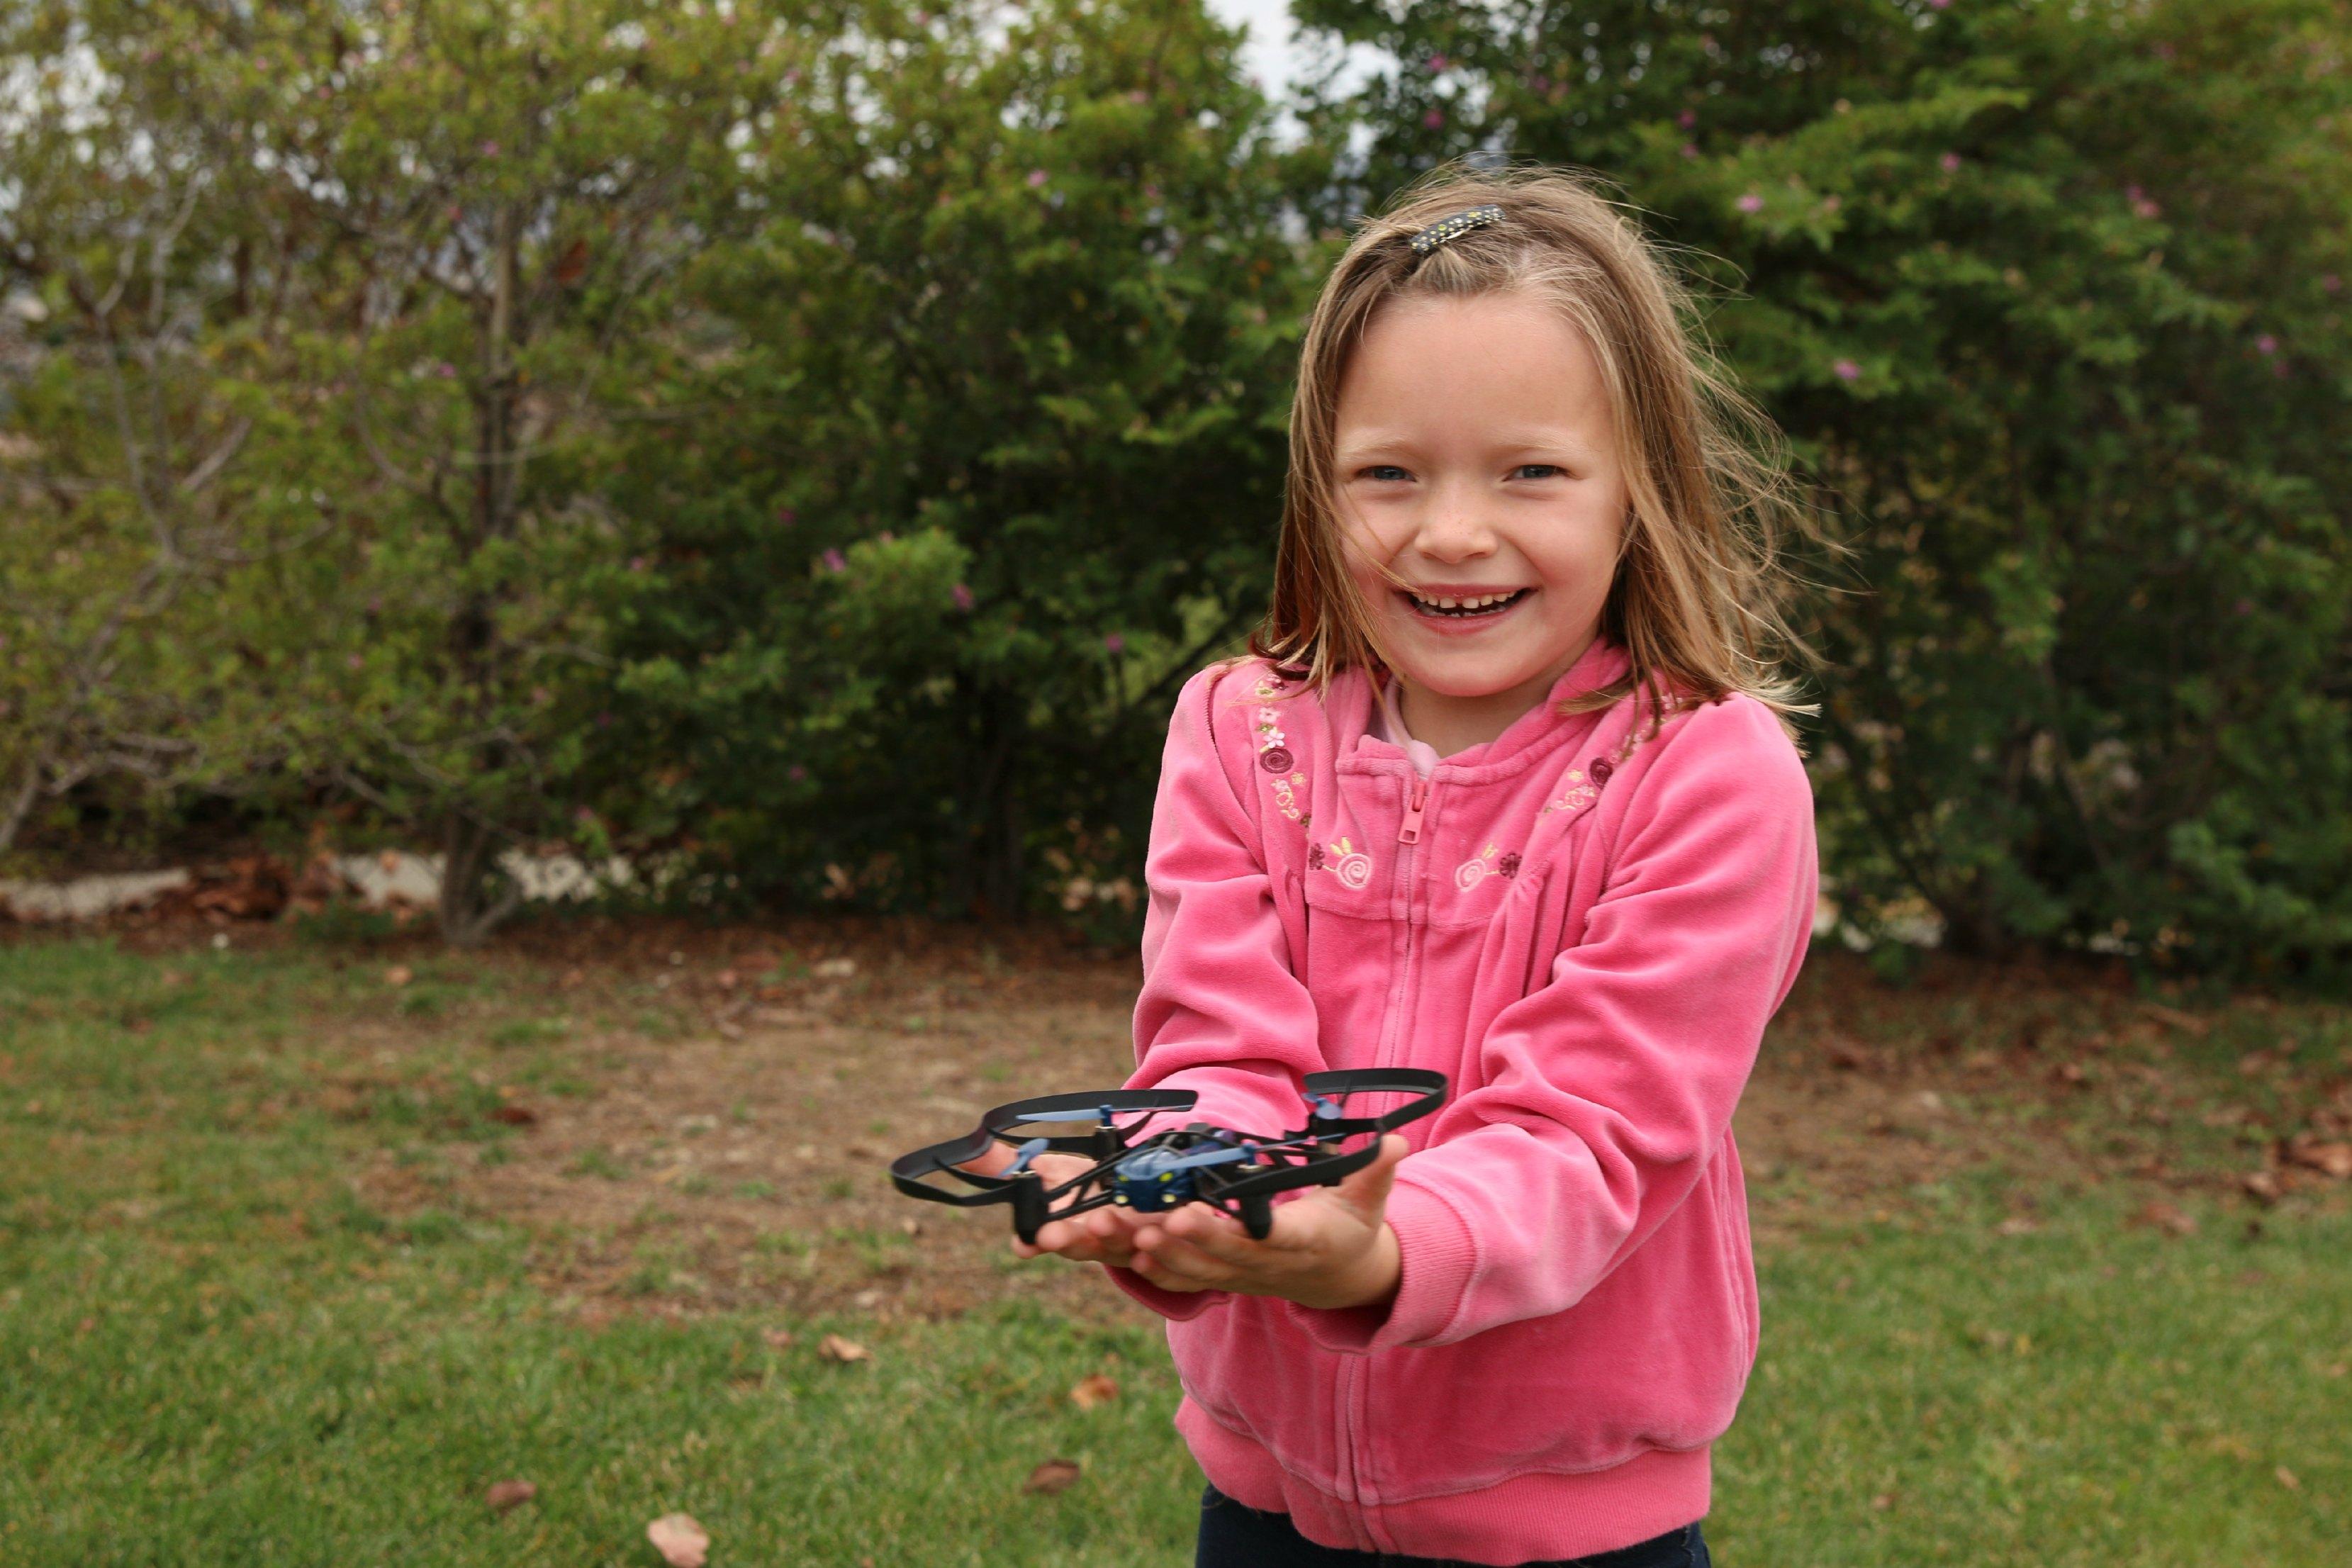 parrot drone review